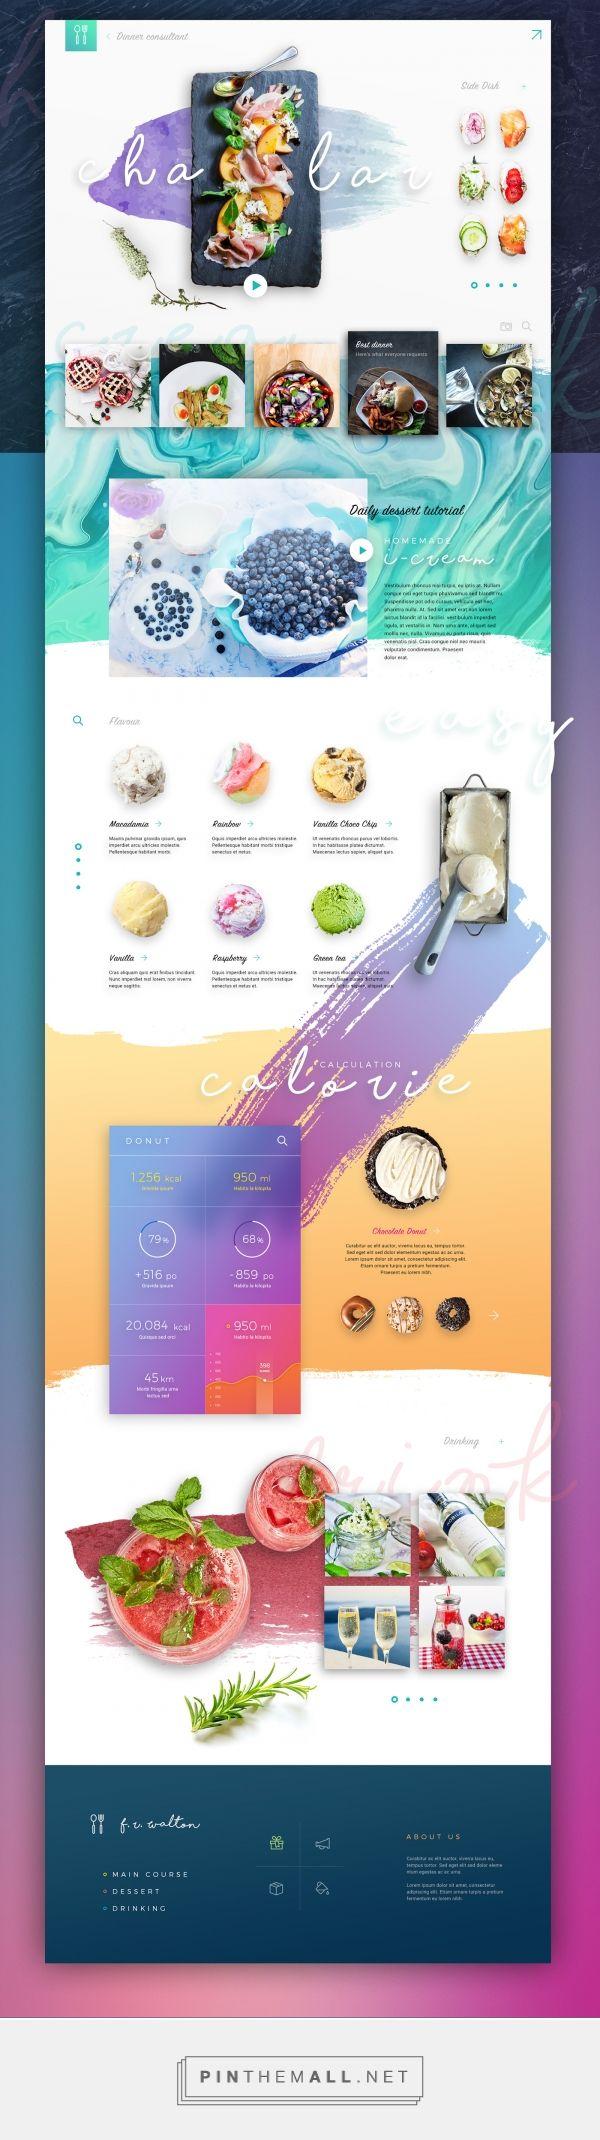 Chalar Restaurant Web Design Inspiration by Tintin S. | Fivestar Branding – Design and Branding Agency & Inspiration Gallery